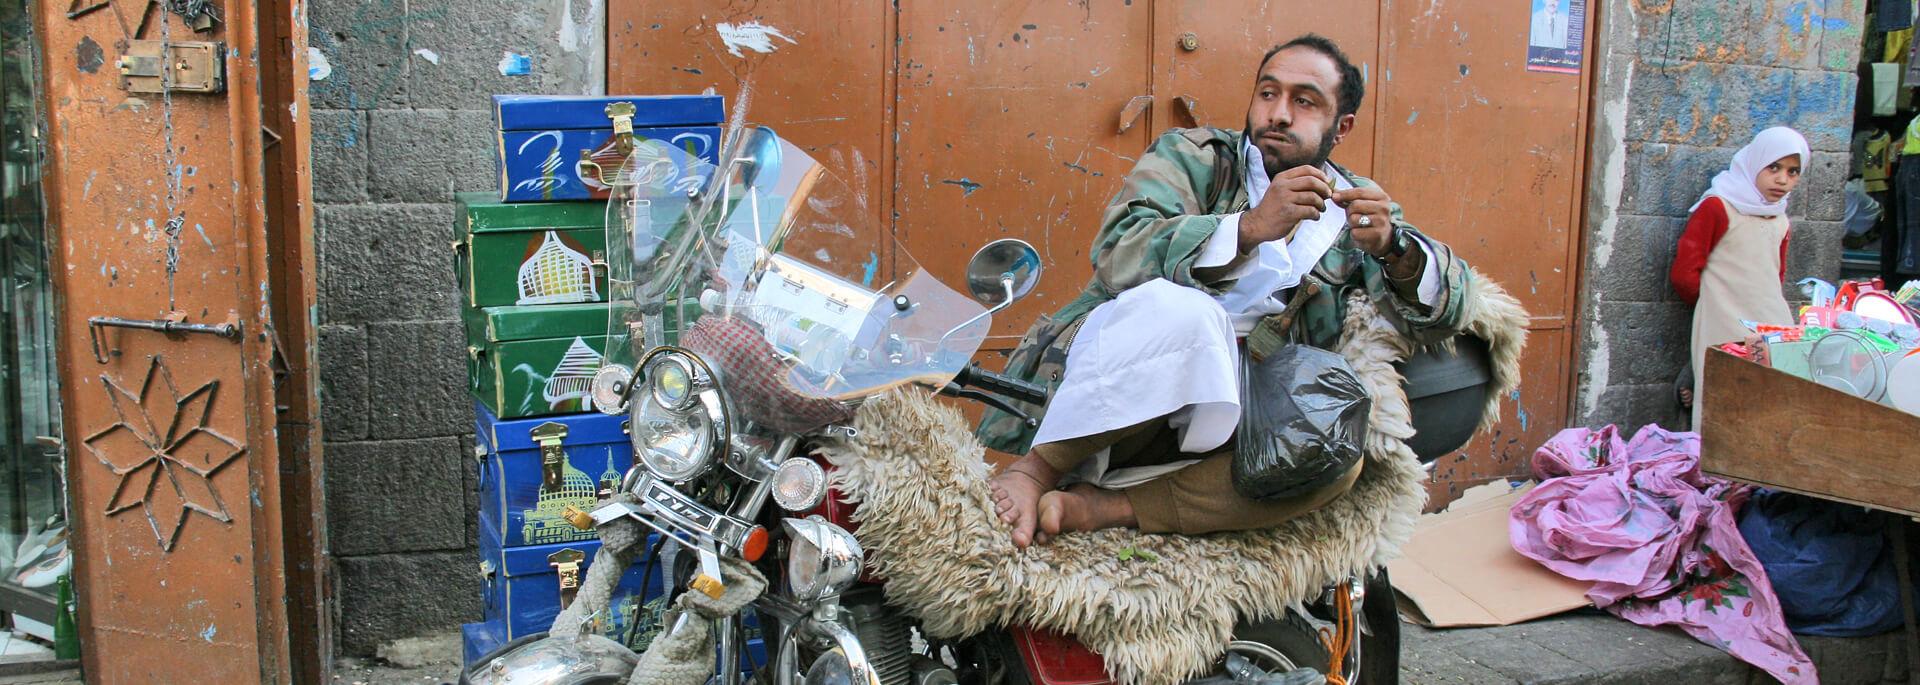 Fotos: Jemens Welterbe Sana'a